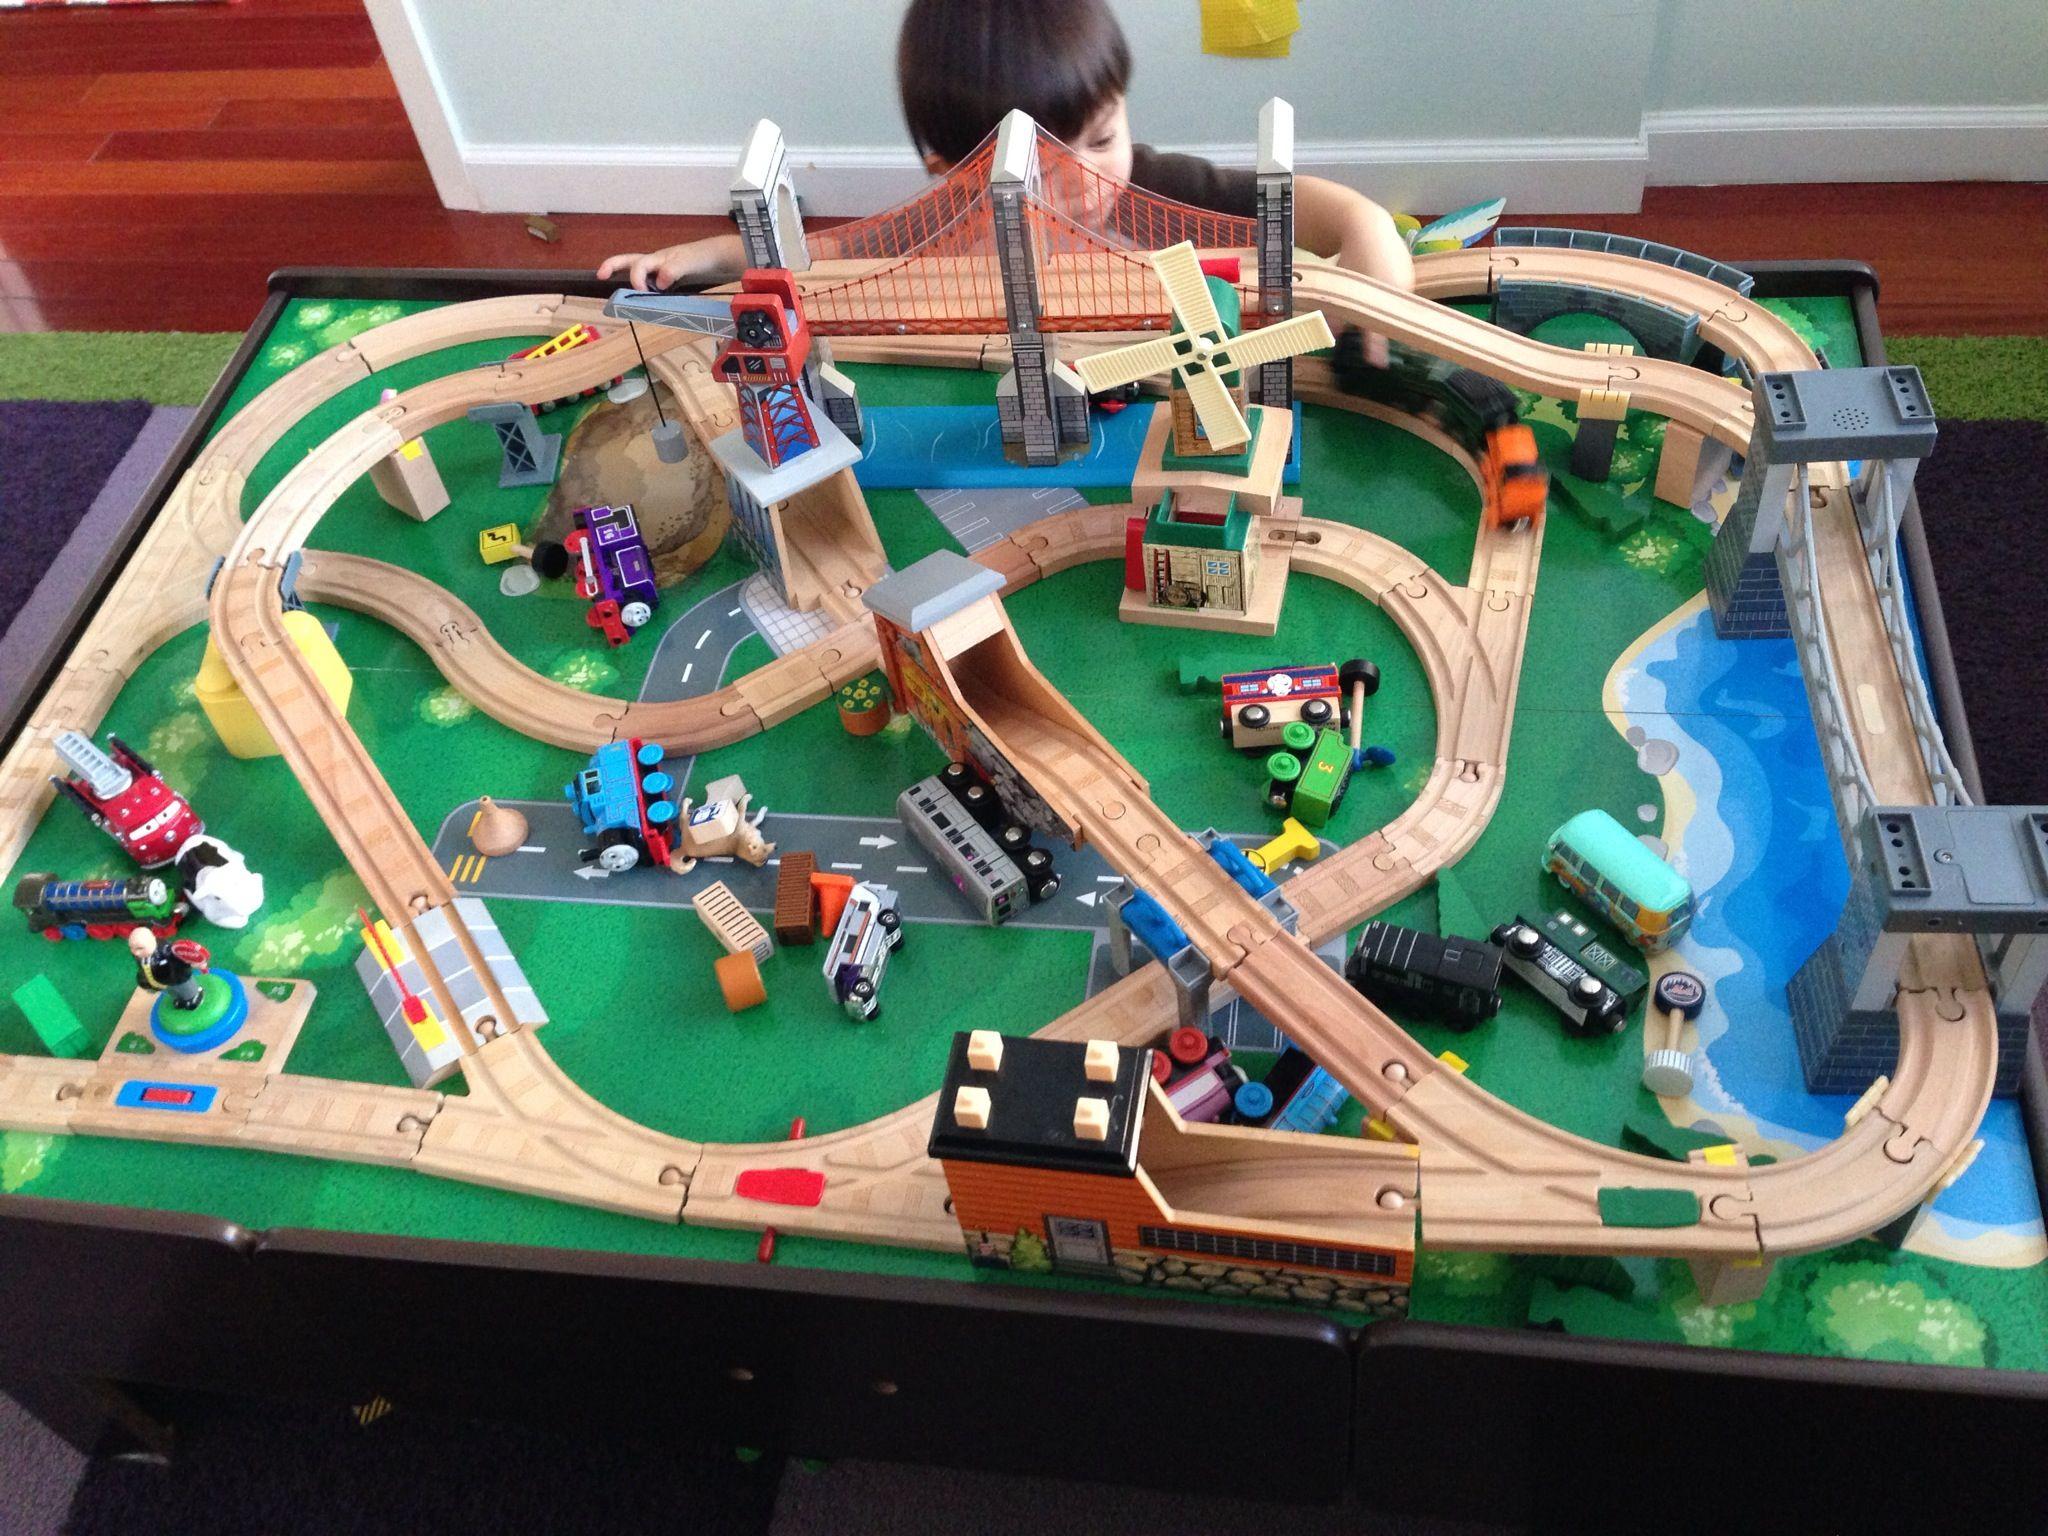 Kids Stuff, Wooden Railway, Thomas The Train, Track Layouts, Advanced  Layoutu2026